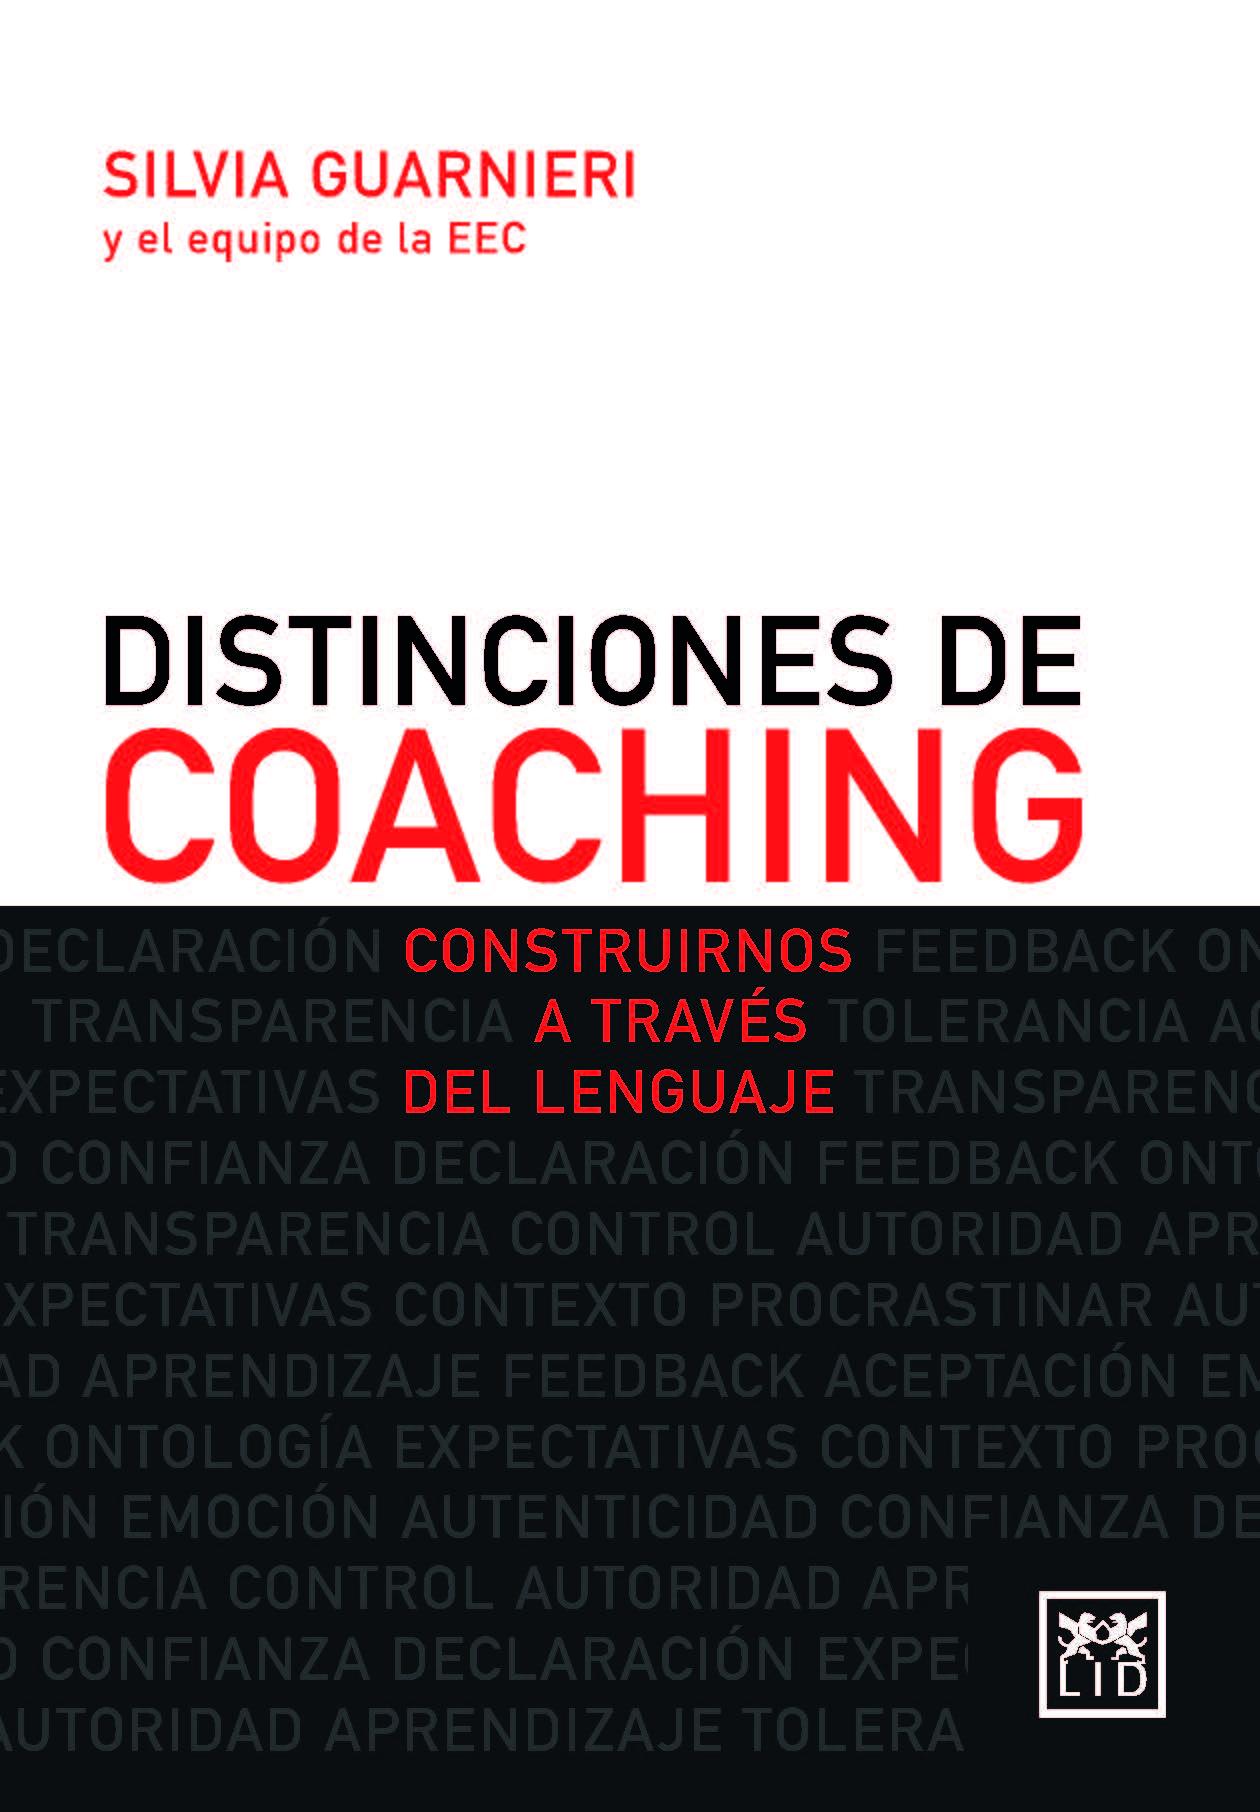 Distinciones del coaching